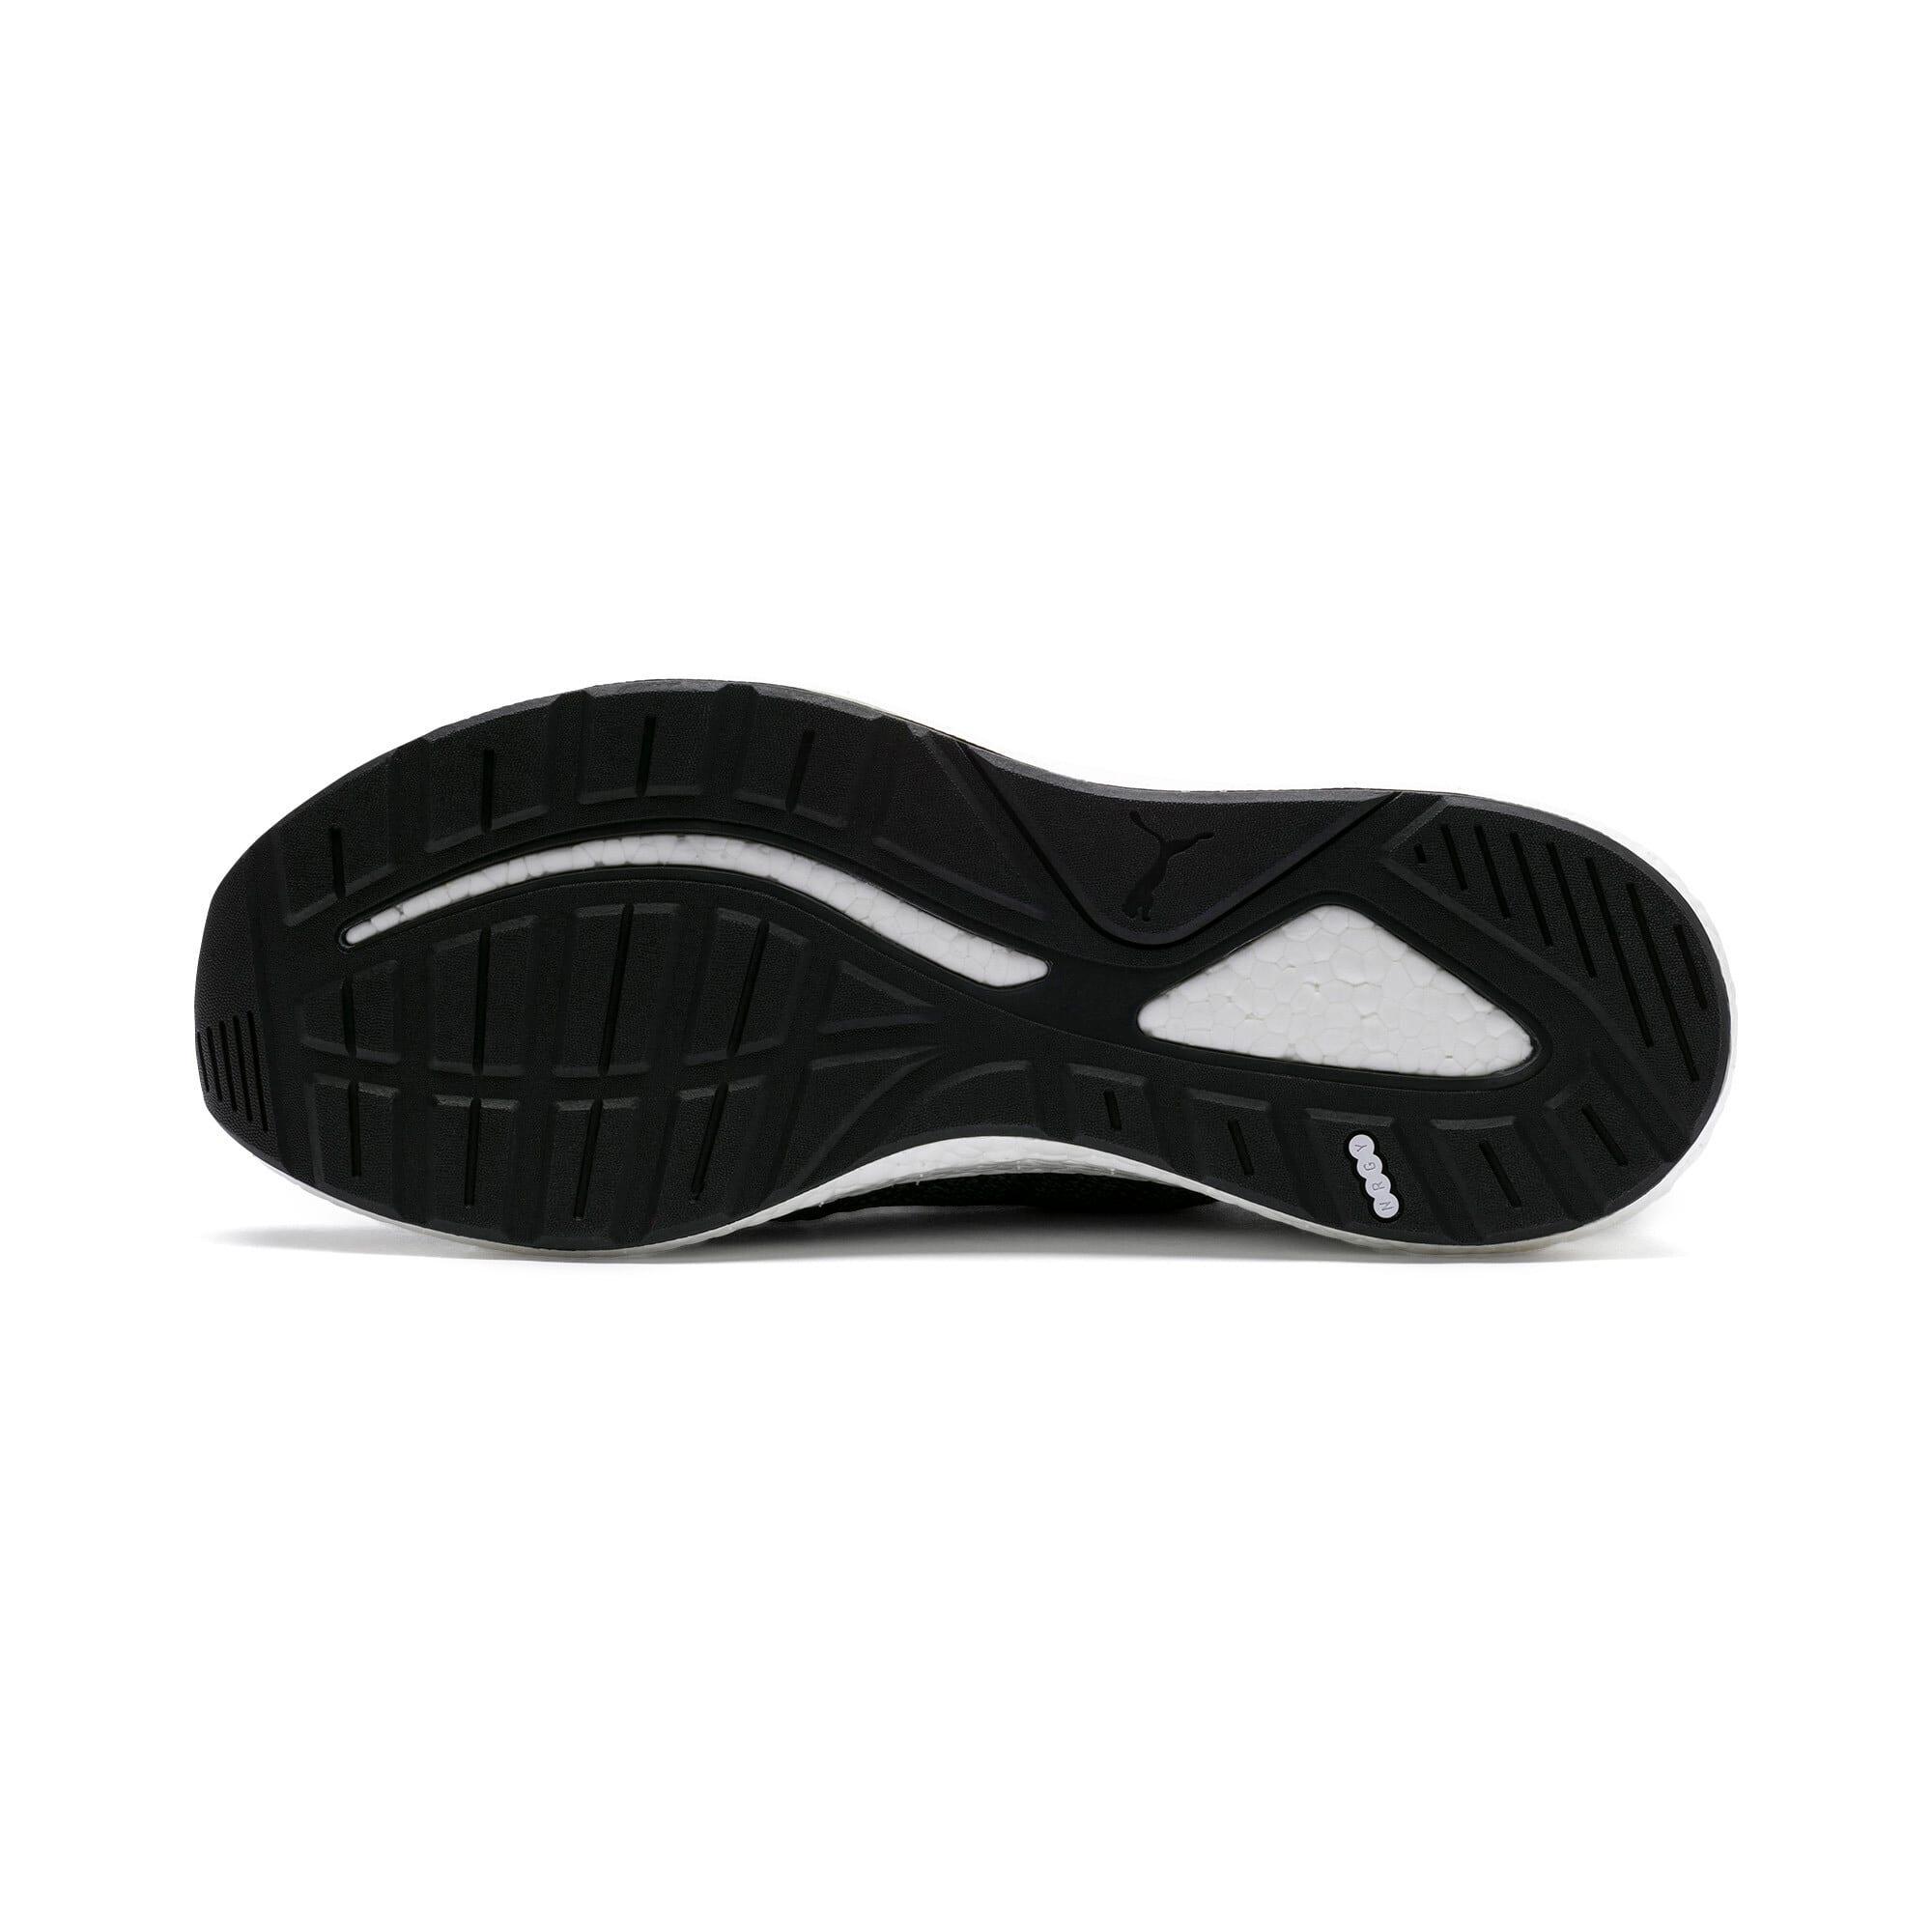 Thumbnail 3 of NRGY Neko Engineer Knit Men's Running Shoes, Puma Black-Iron Gate, medium